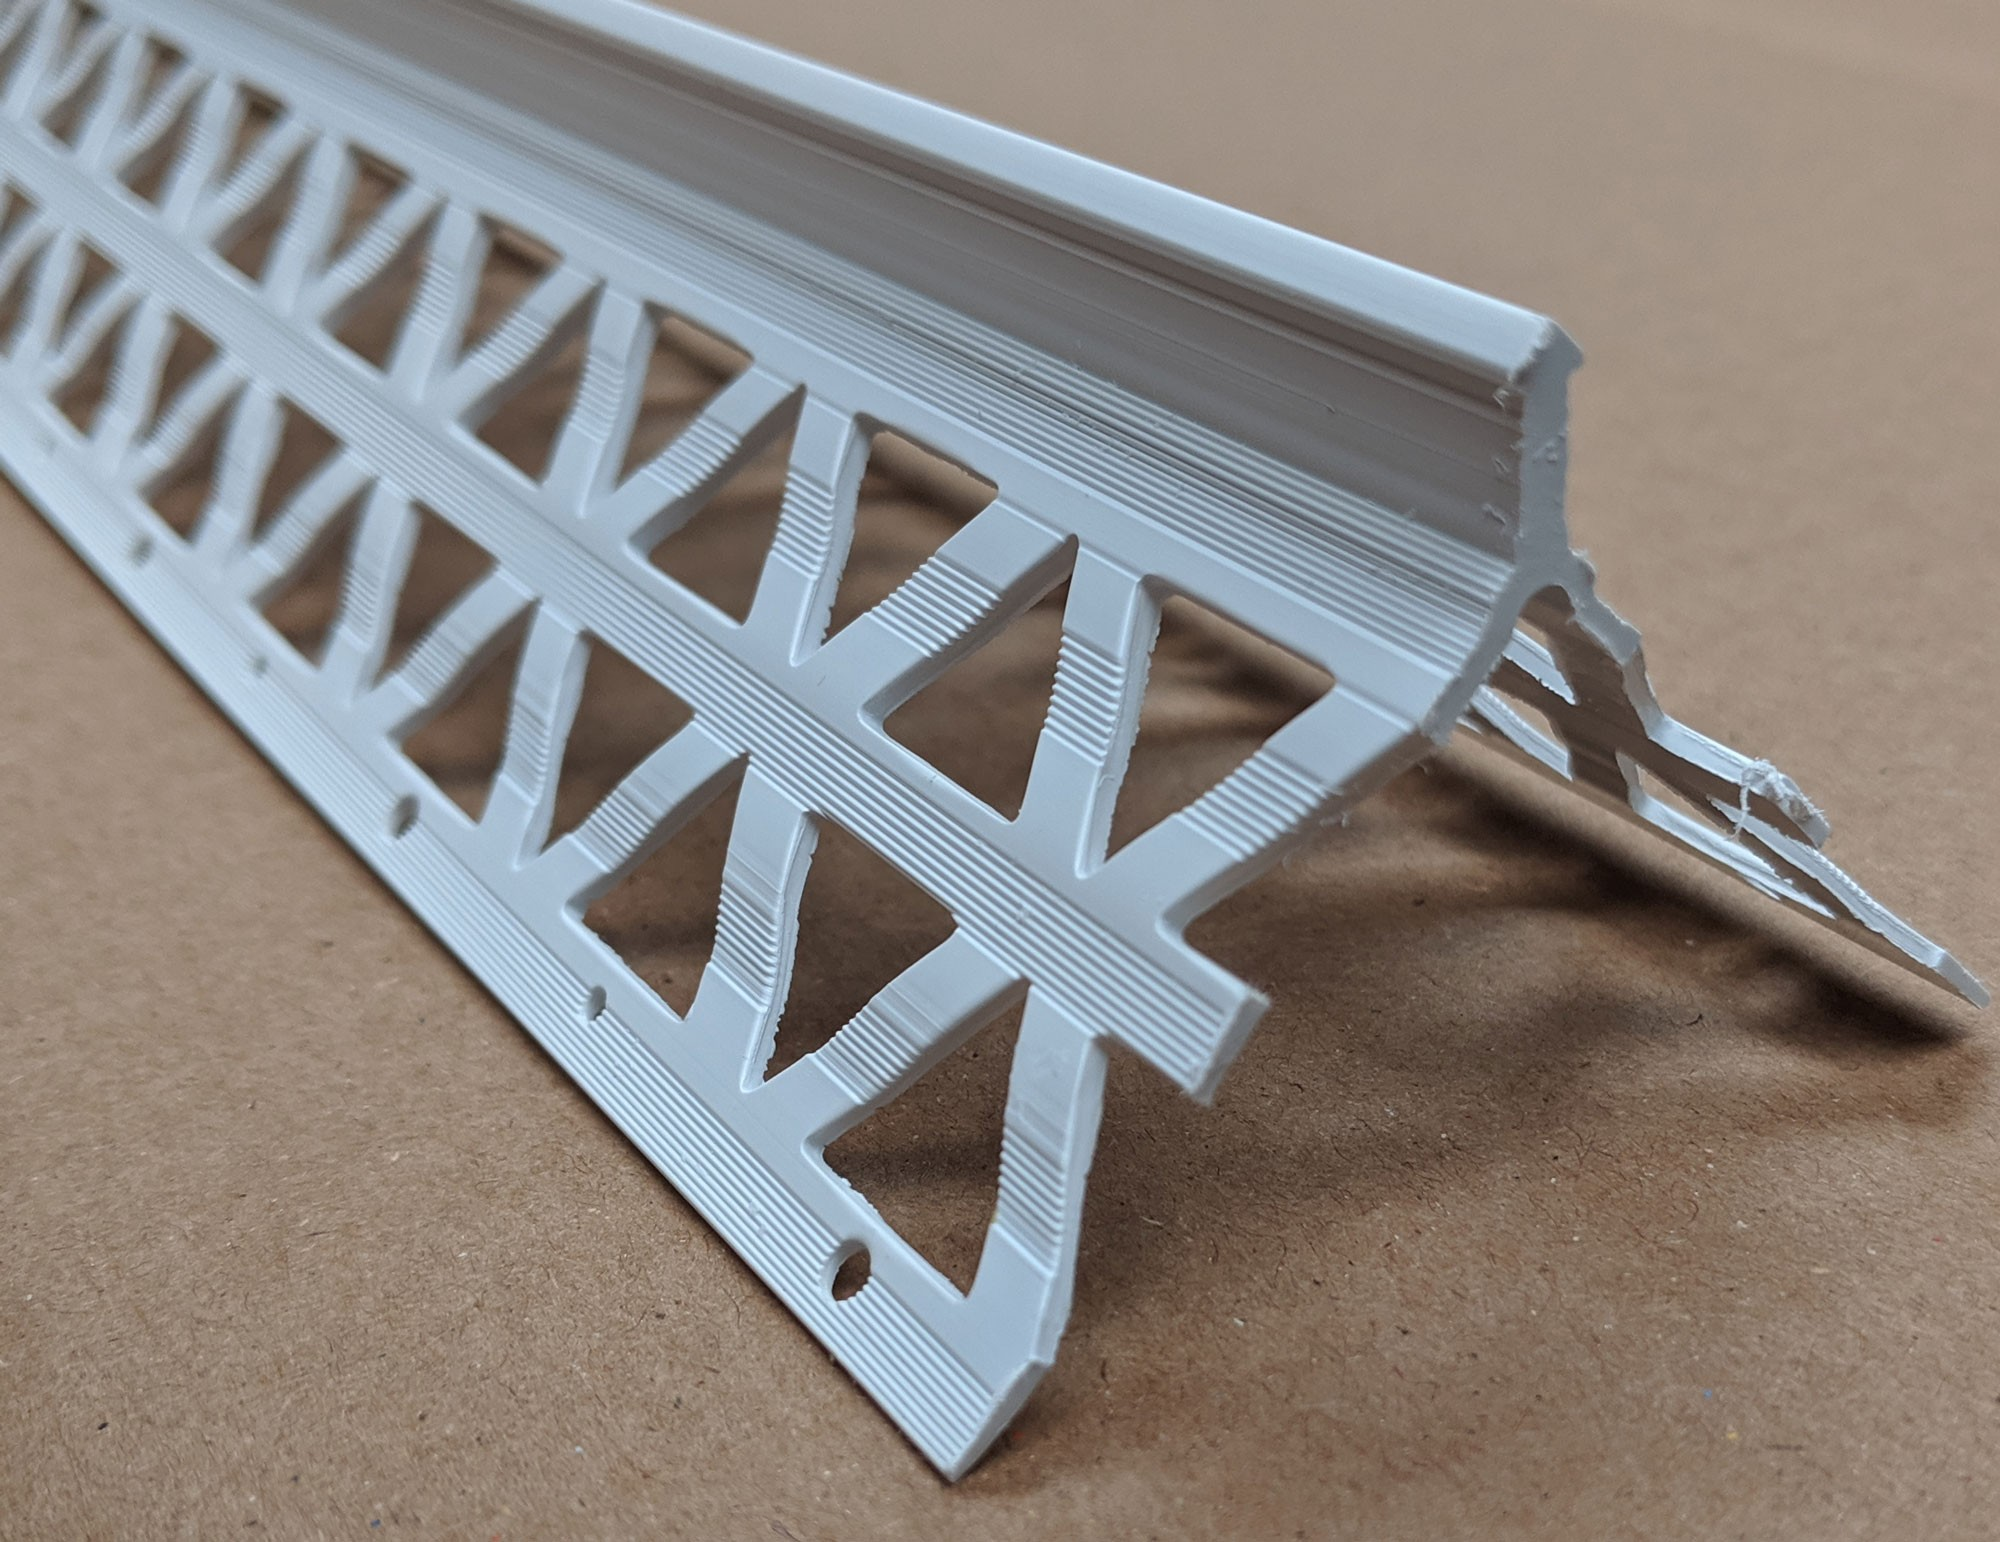 Pack of 10 Plasterboard 6-8 mm White Wemico PVC Corner Bead 2.5M Length